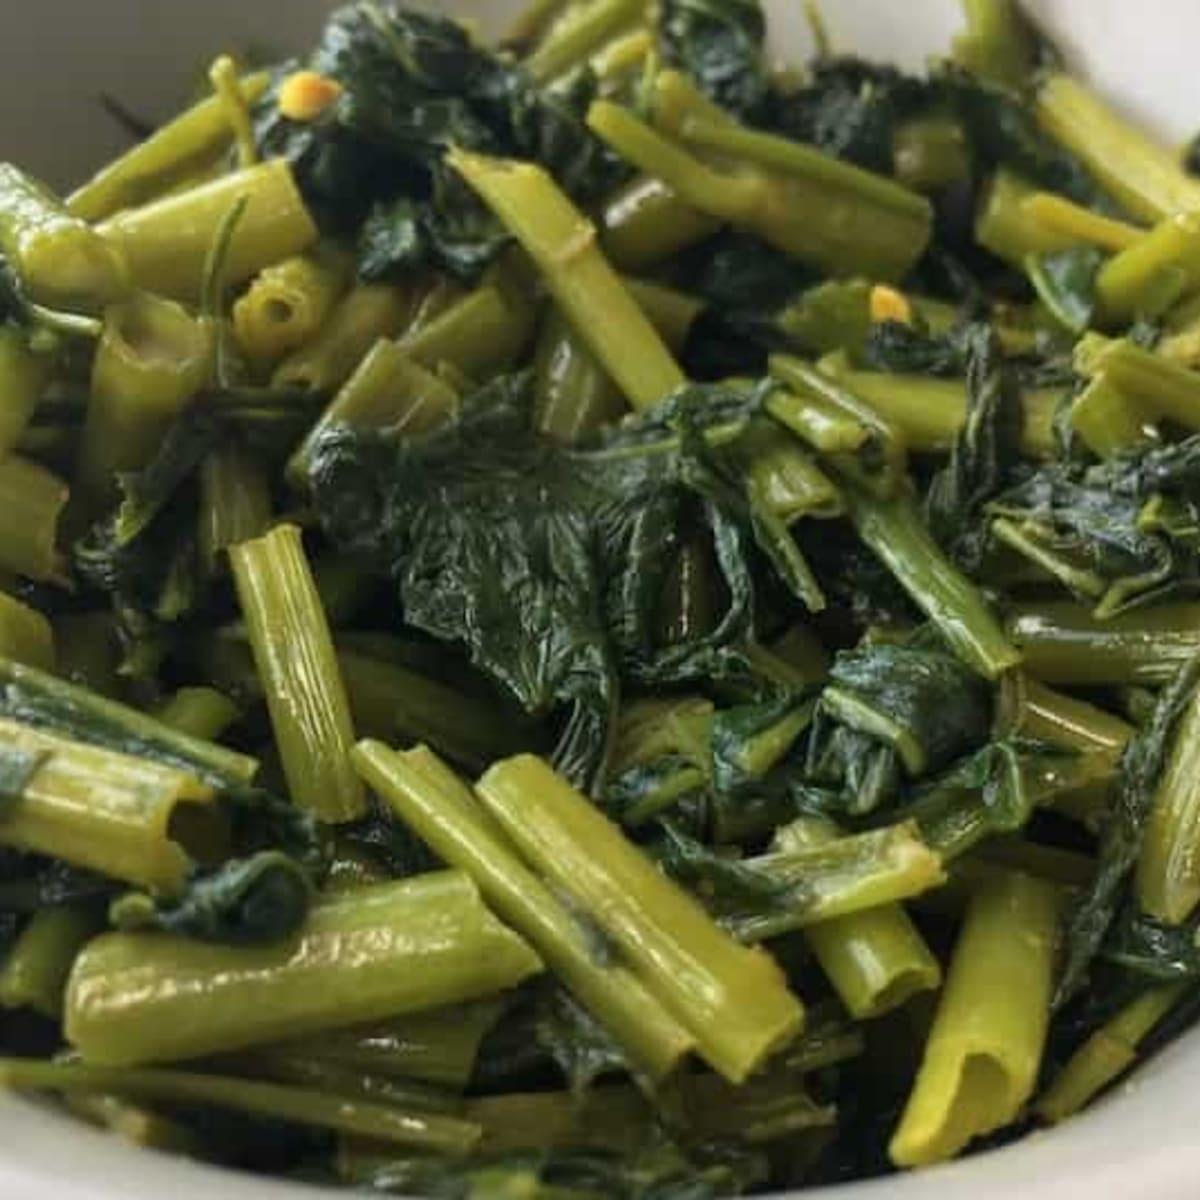 Filipino Style Blanched Kangkong Water Spinach Salad Delishably Food And Drink